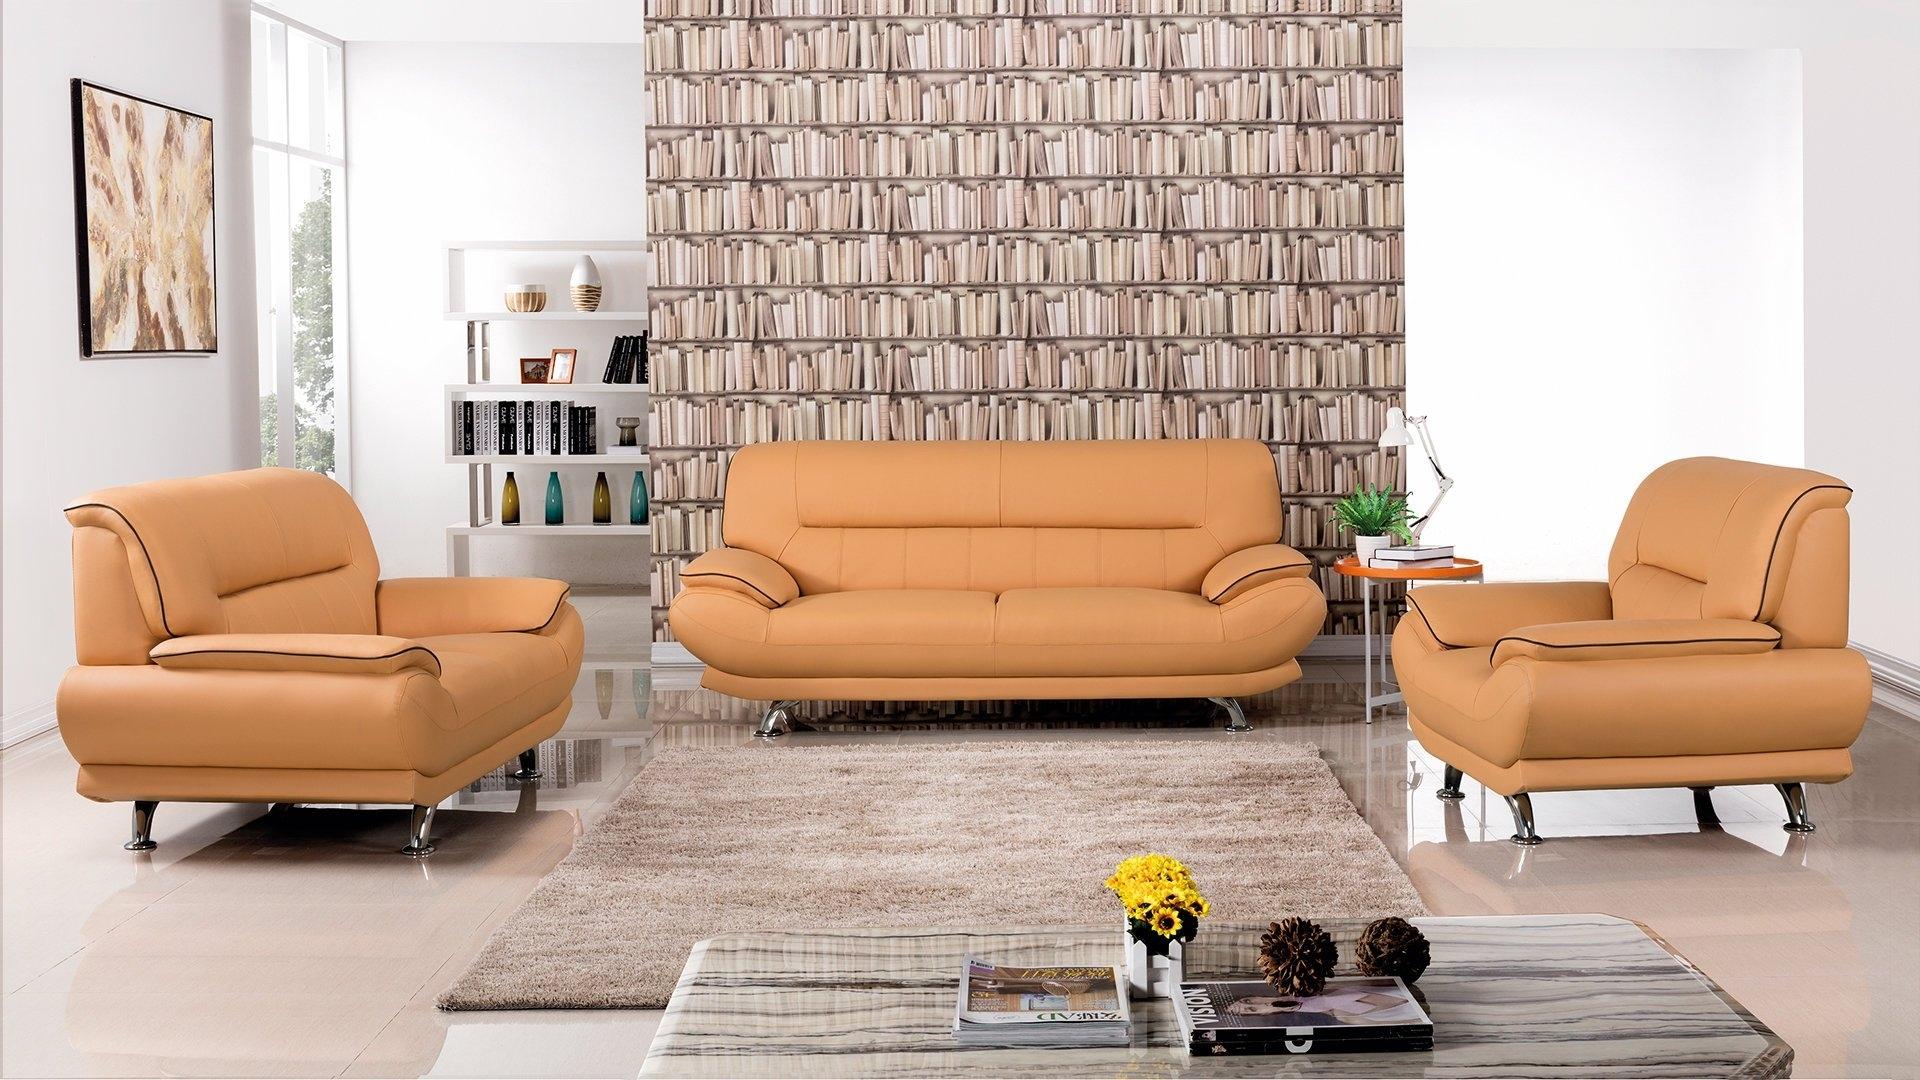 Natural 25 Wayfair Reclining Sofas Original | Russiandesignshow regarding Burton Leather 3 Piece Sectionals With Ottoman